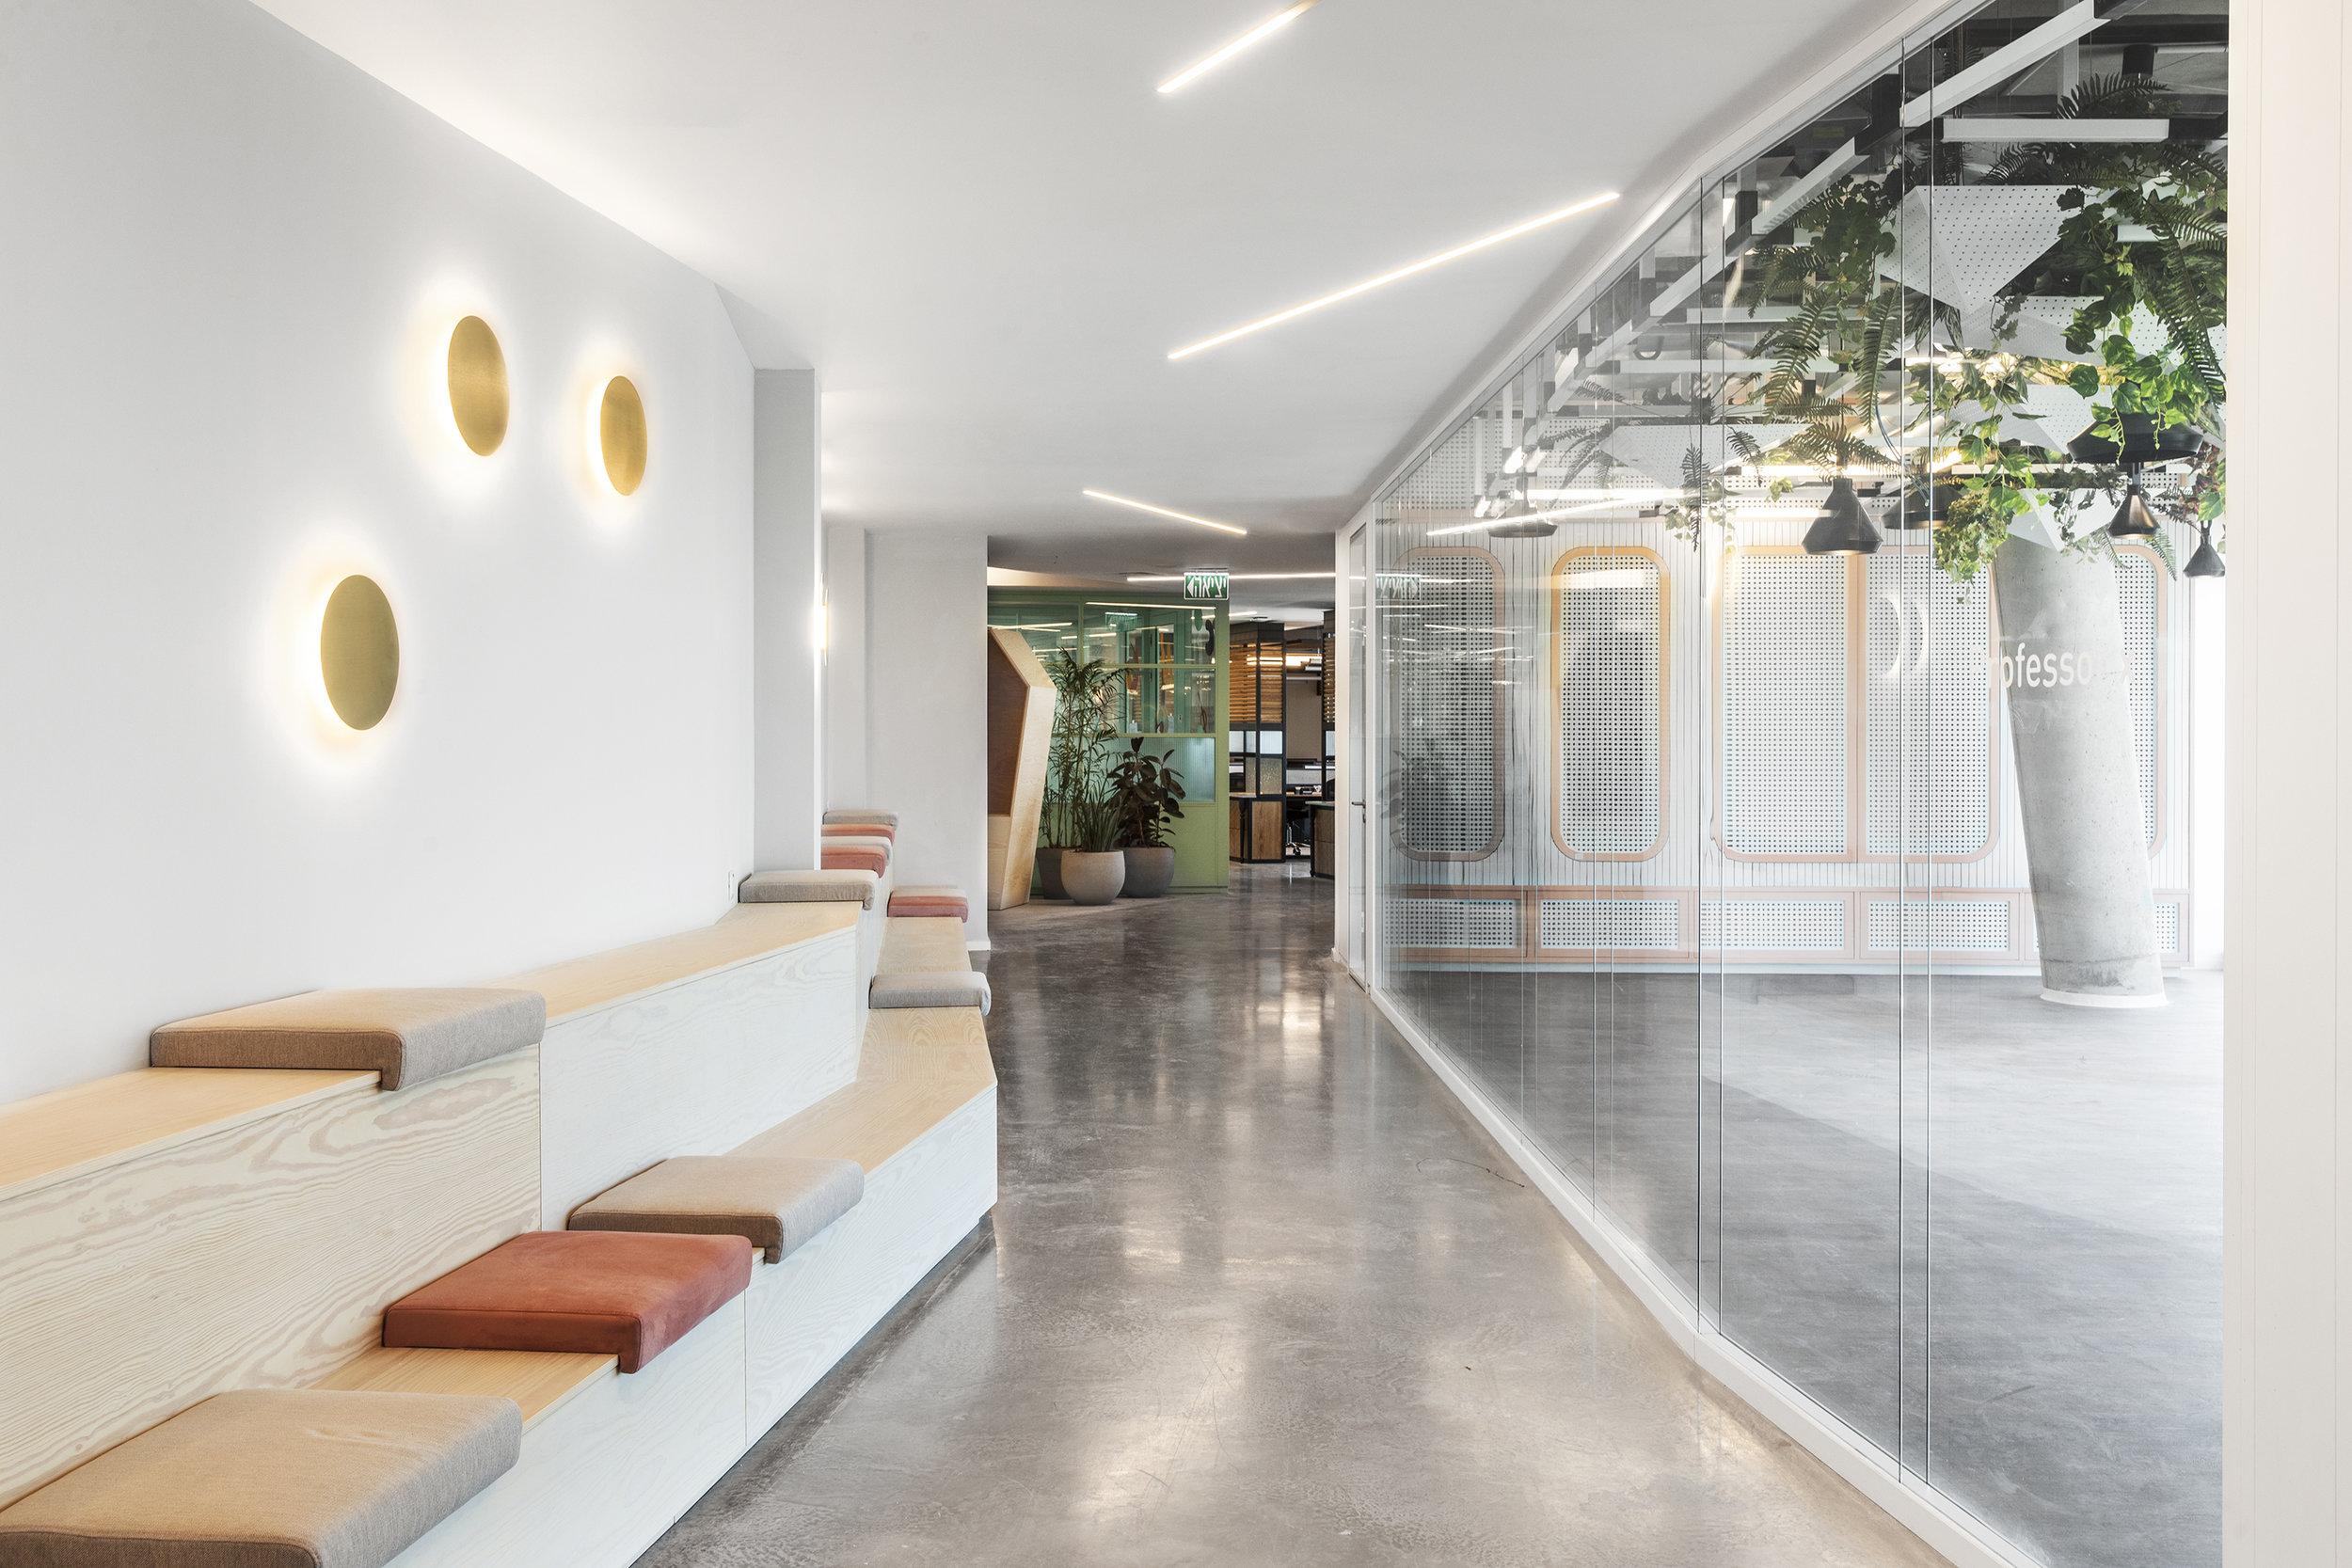 רואי דוד אדריכלות - אדריכל - נטורל אינטליג'נס - ROY DAVID - ARCHITECTURE - ARCHITECT - NI (66).jpg